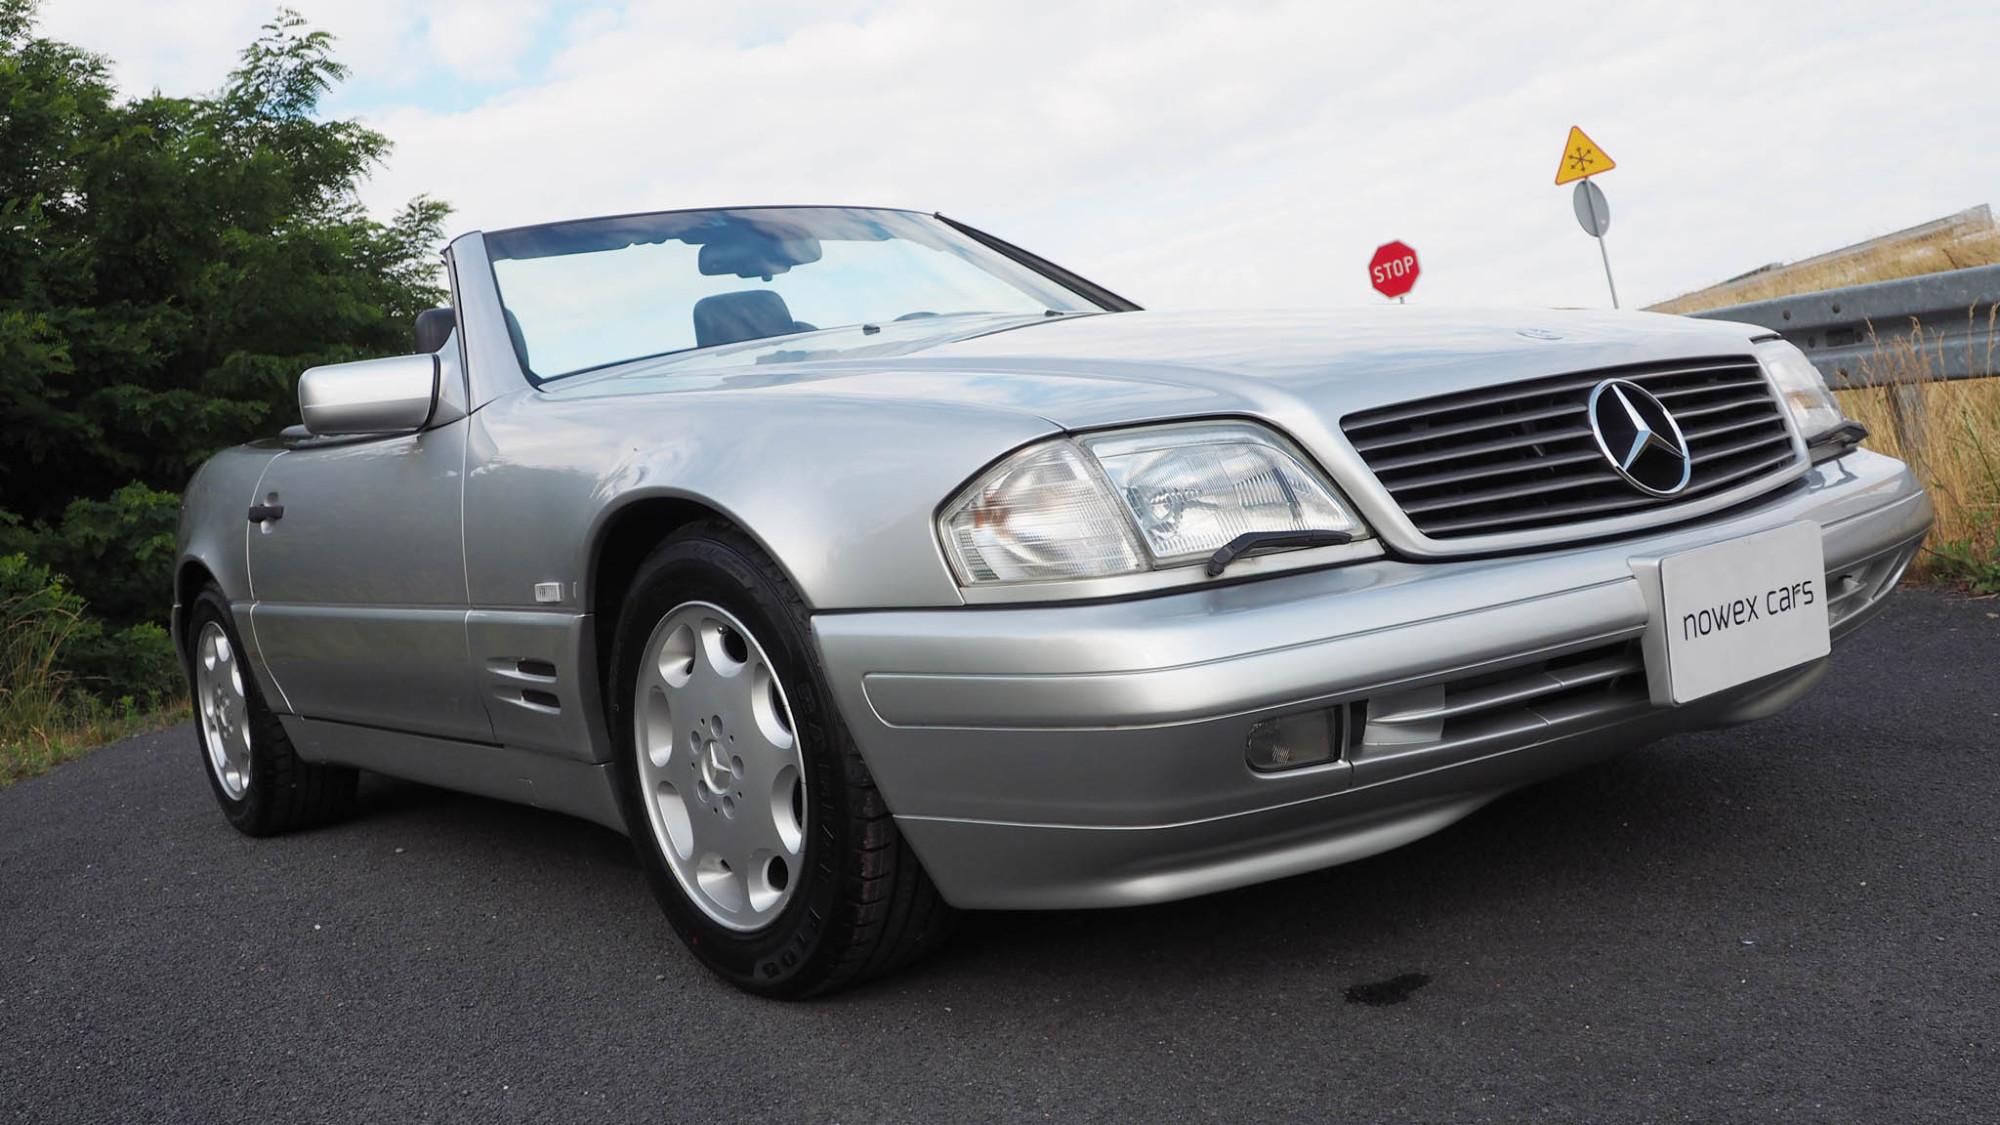 97 mercedes benz sl 320 nowex cars for 97 mercedes benz